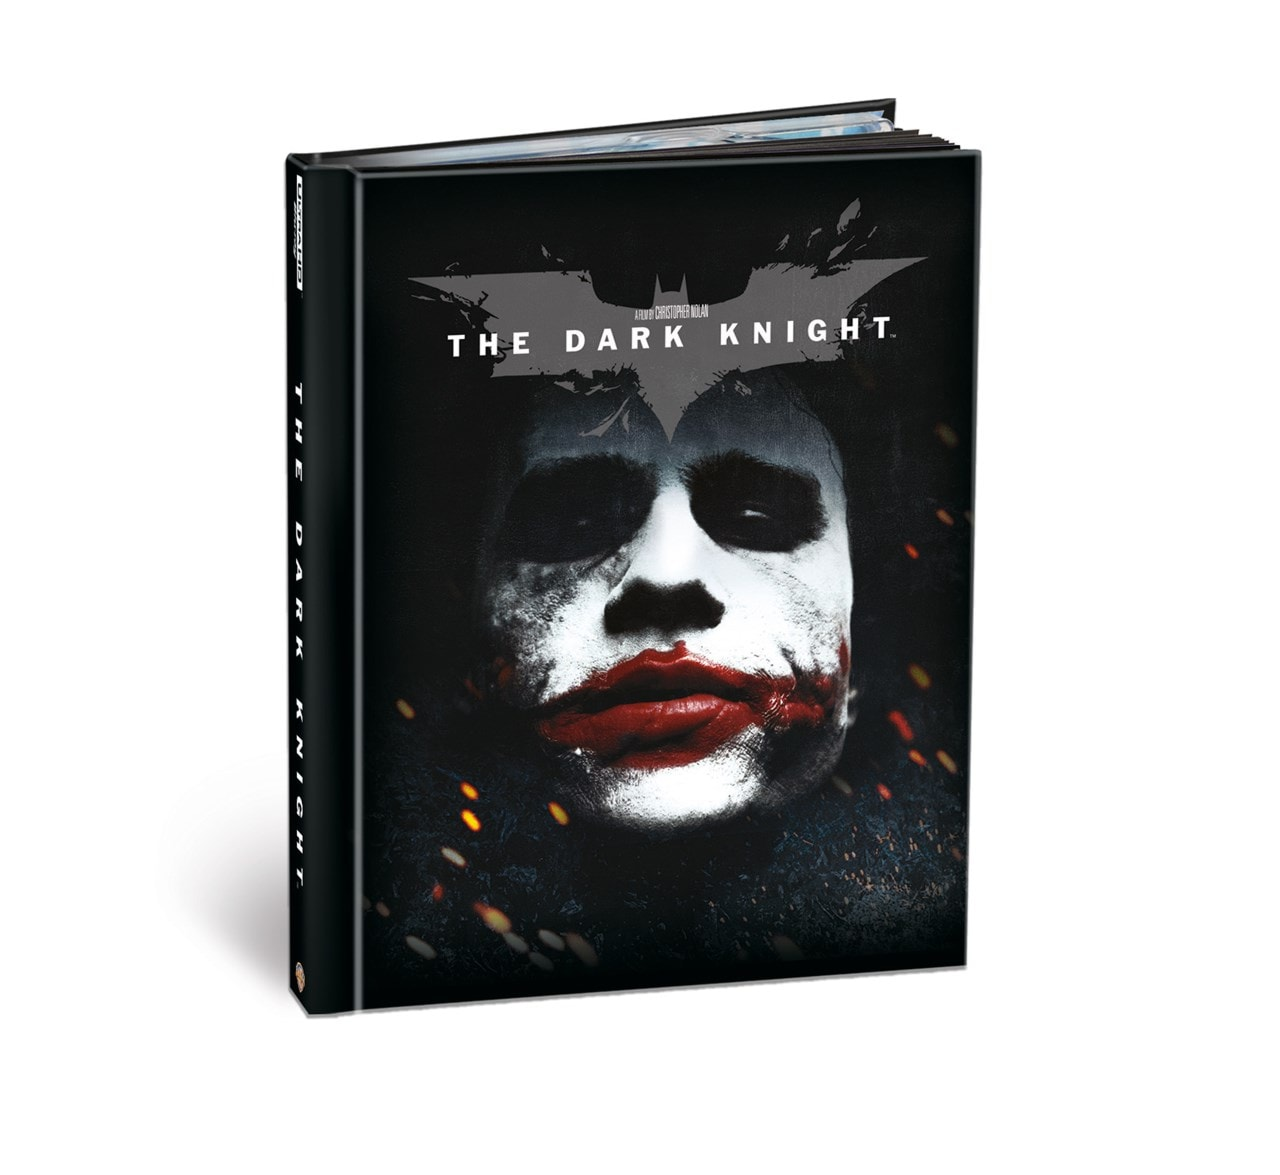 The Dark Knight - 2